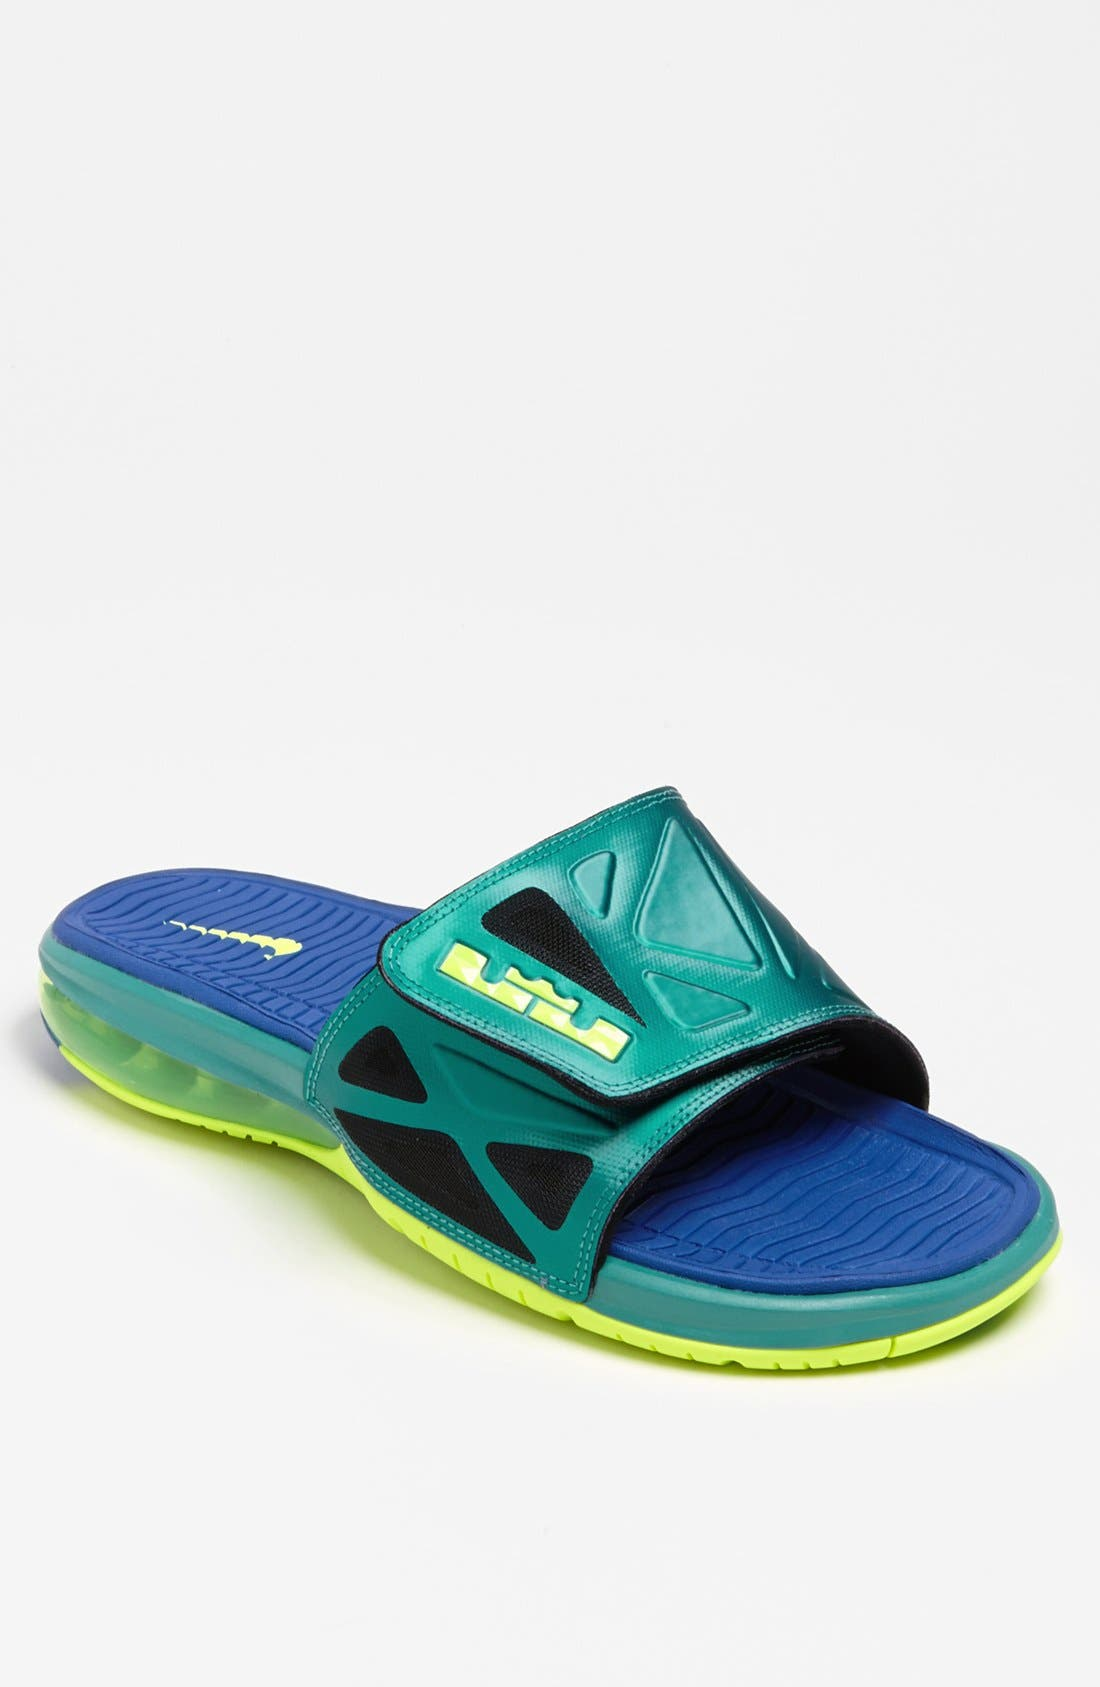 Main Image - Nike 'Air LeBron 2 Slide Elite' Sandal (Men)